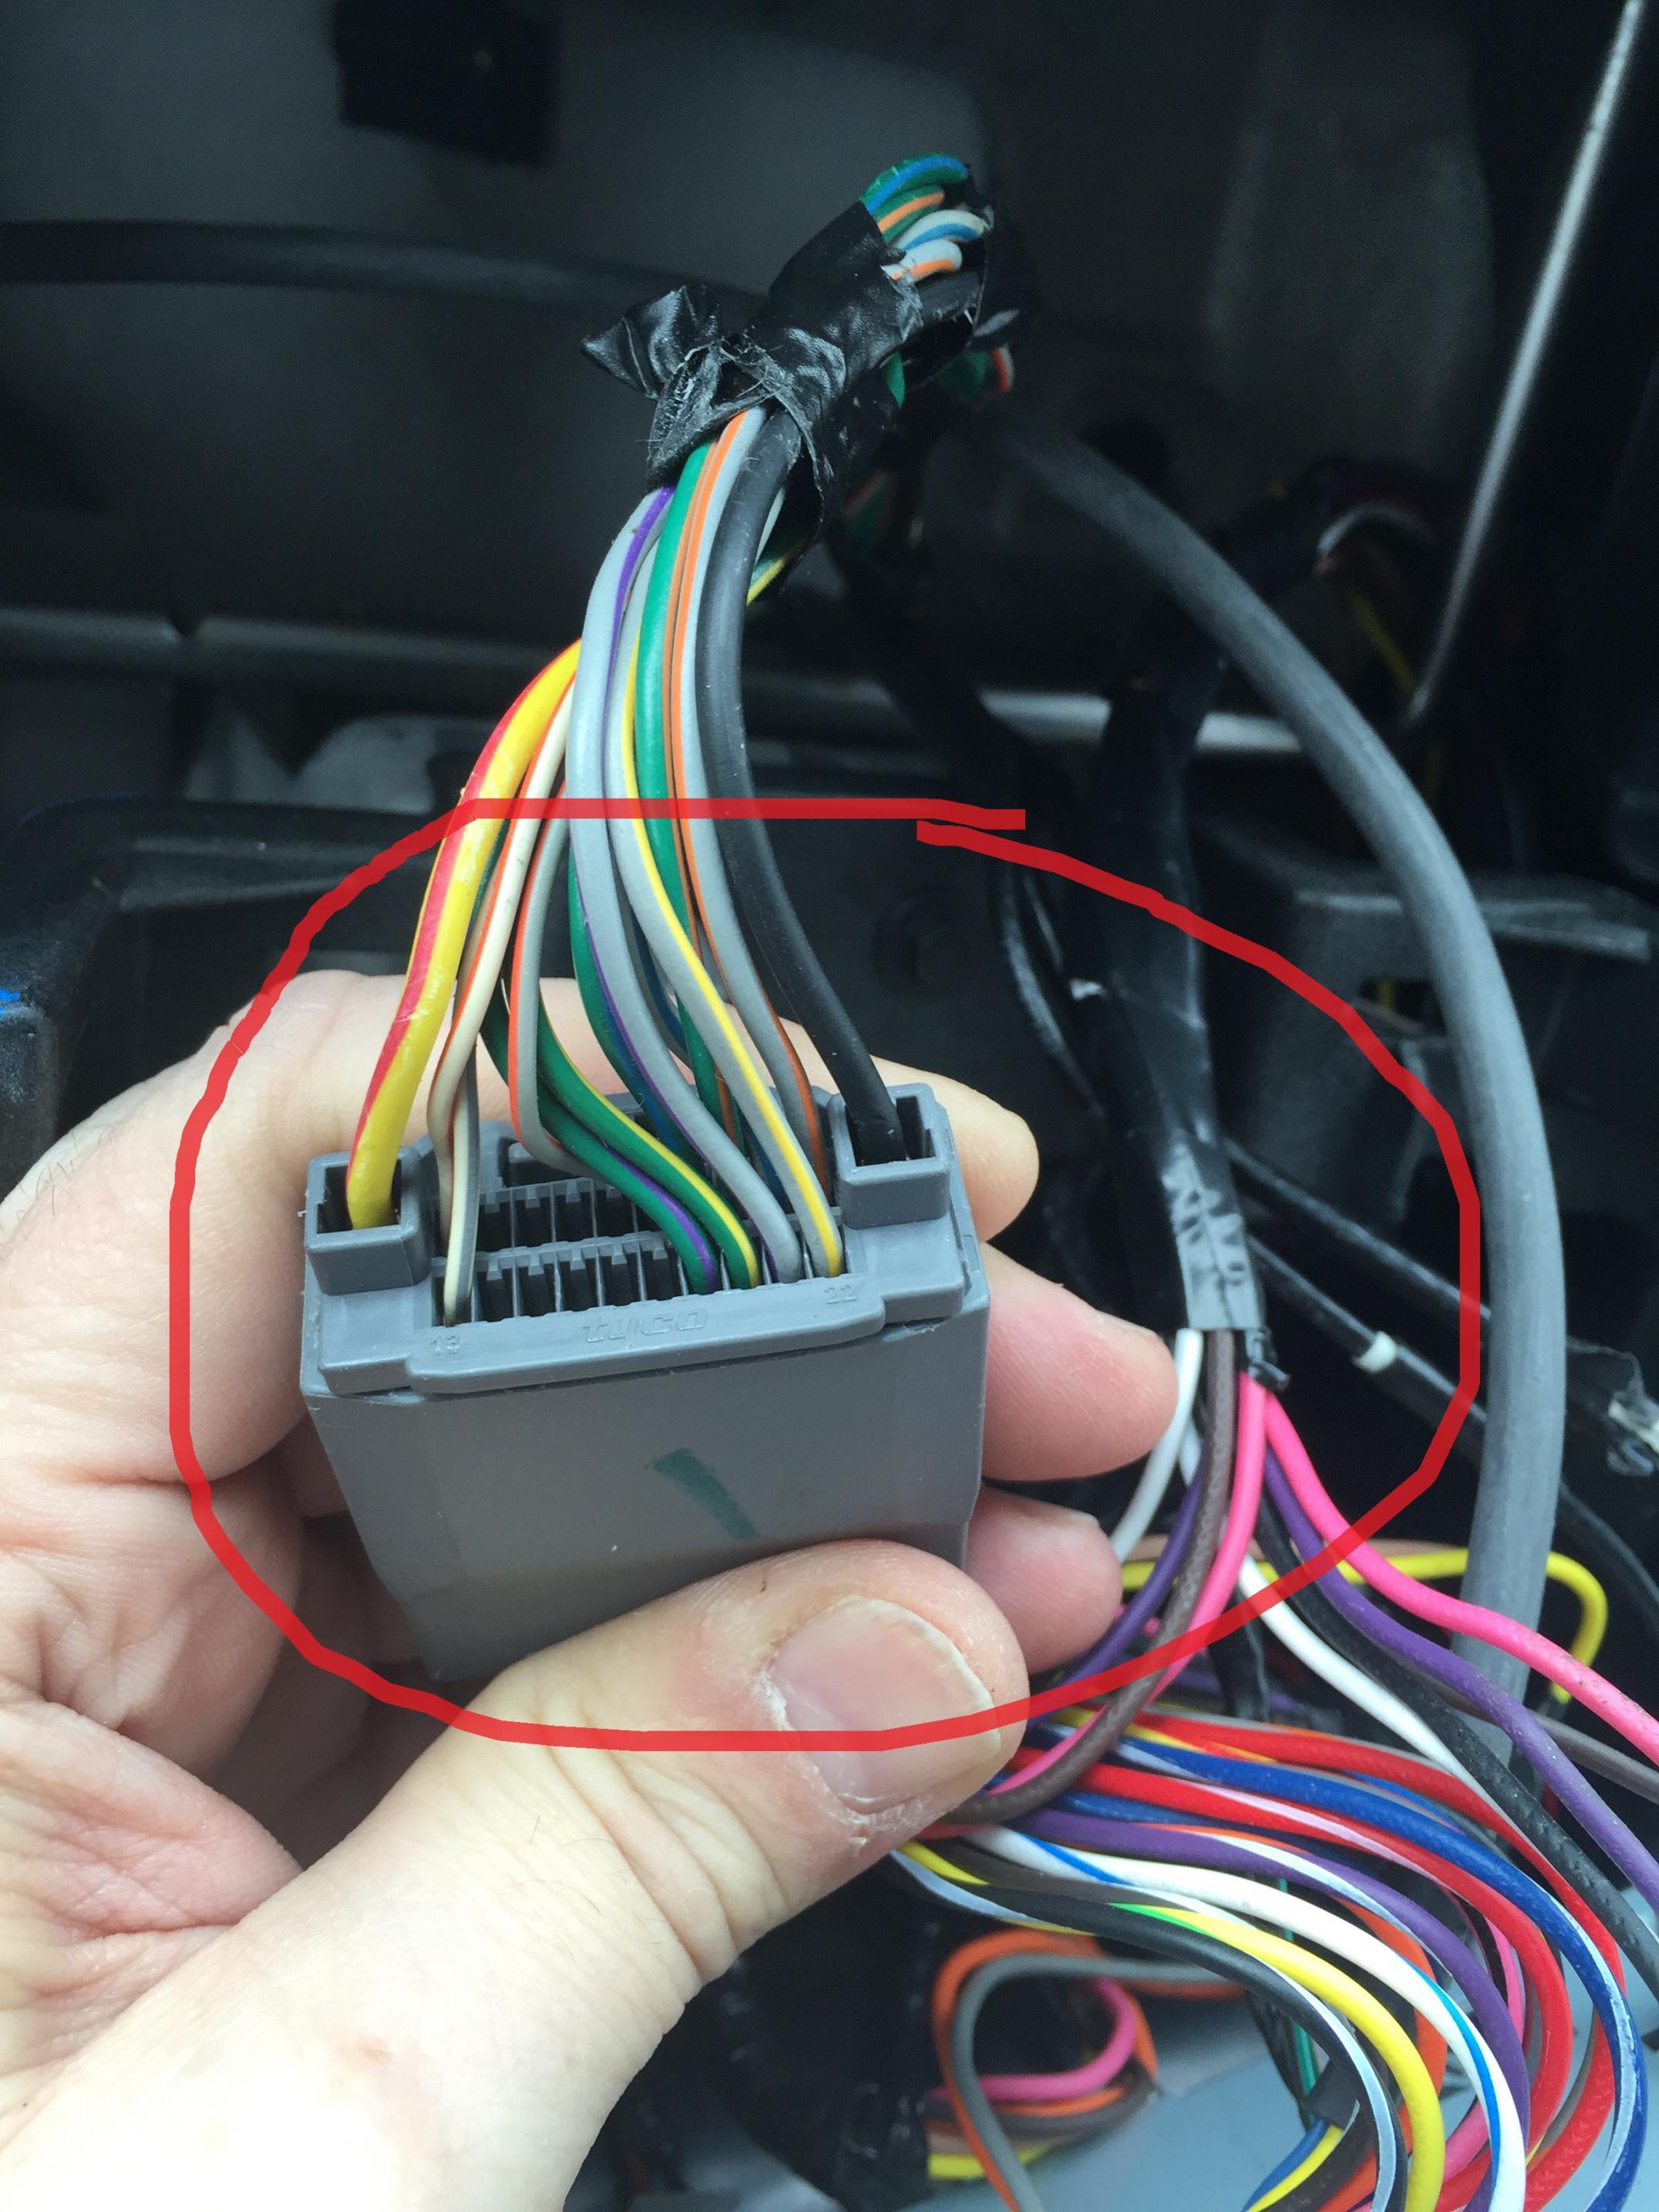 2014 Jeep 430 Uconnect Wiring Diagram Wiring Diagram Resource Resource Led Illumina It